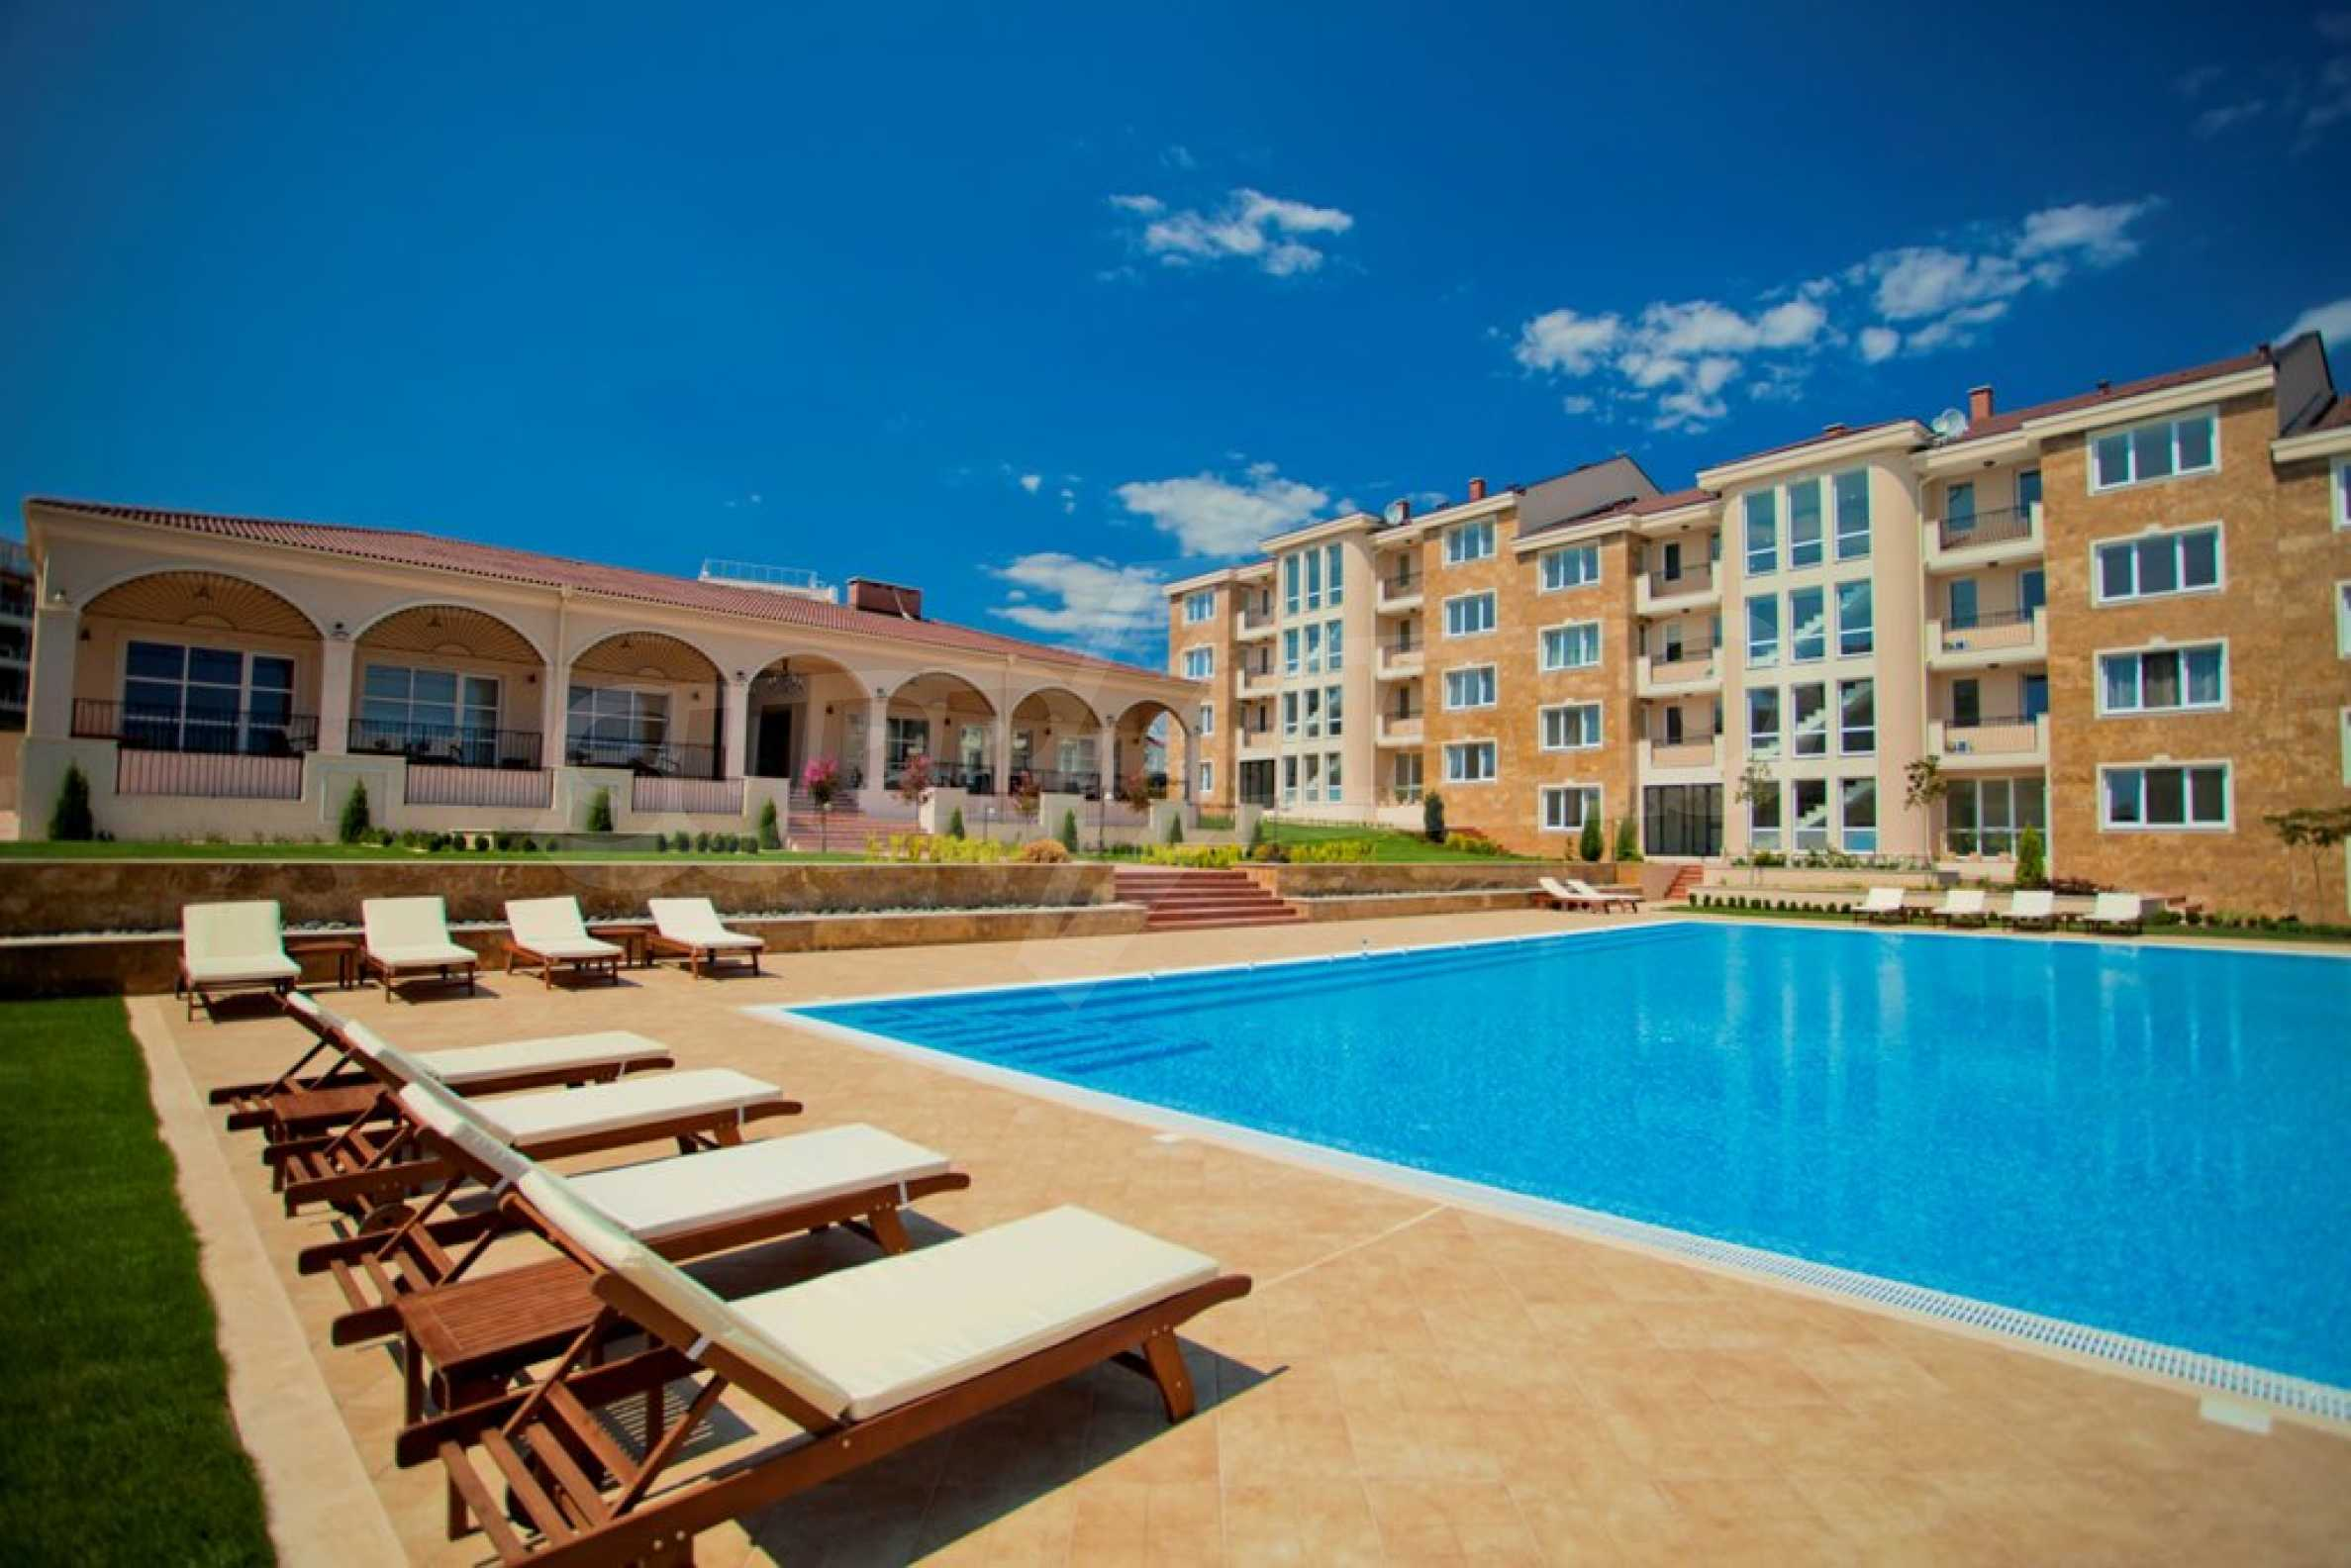 New apartment complex Atia resort in Chernomorets 5